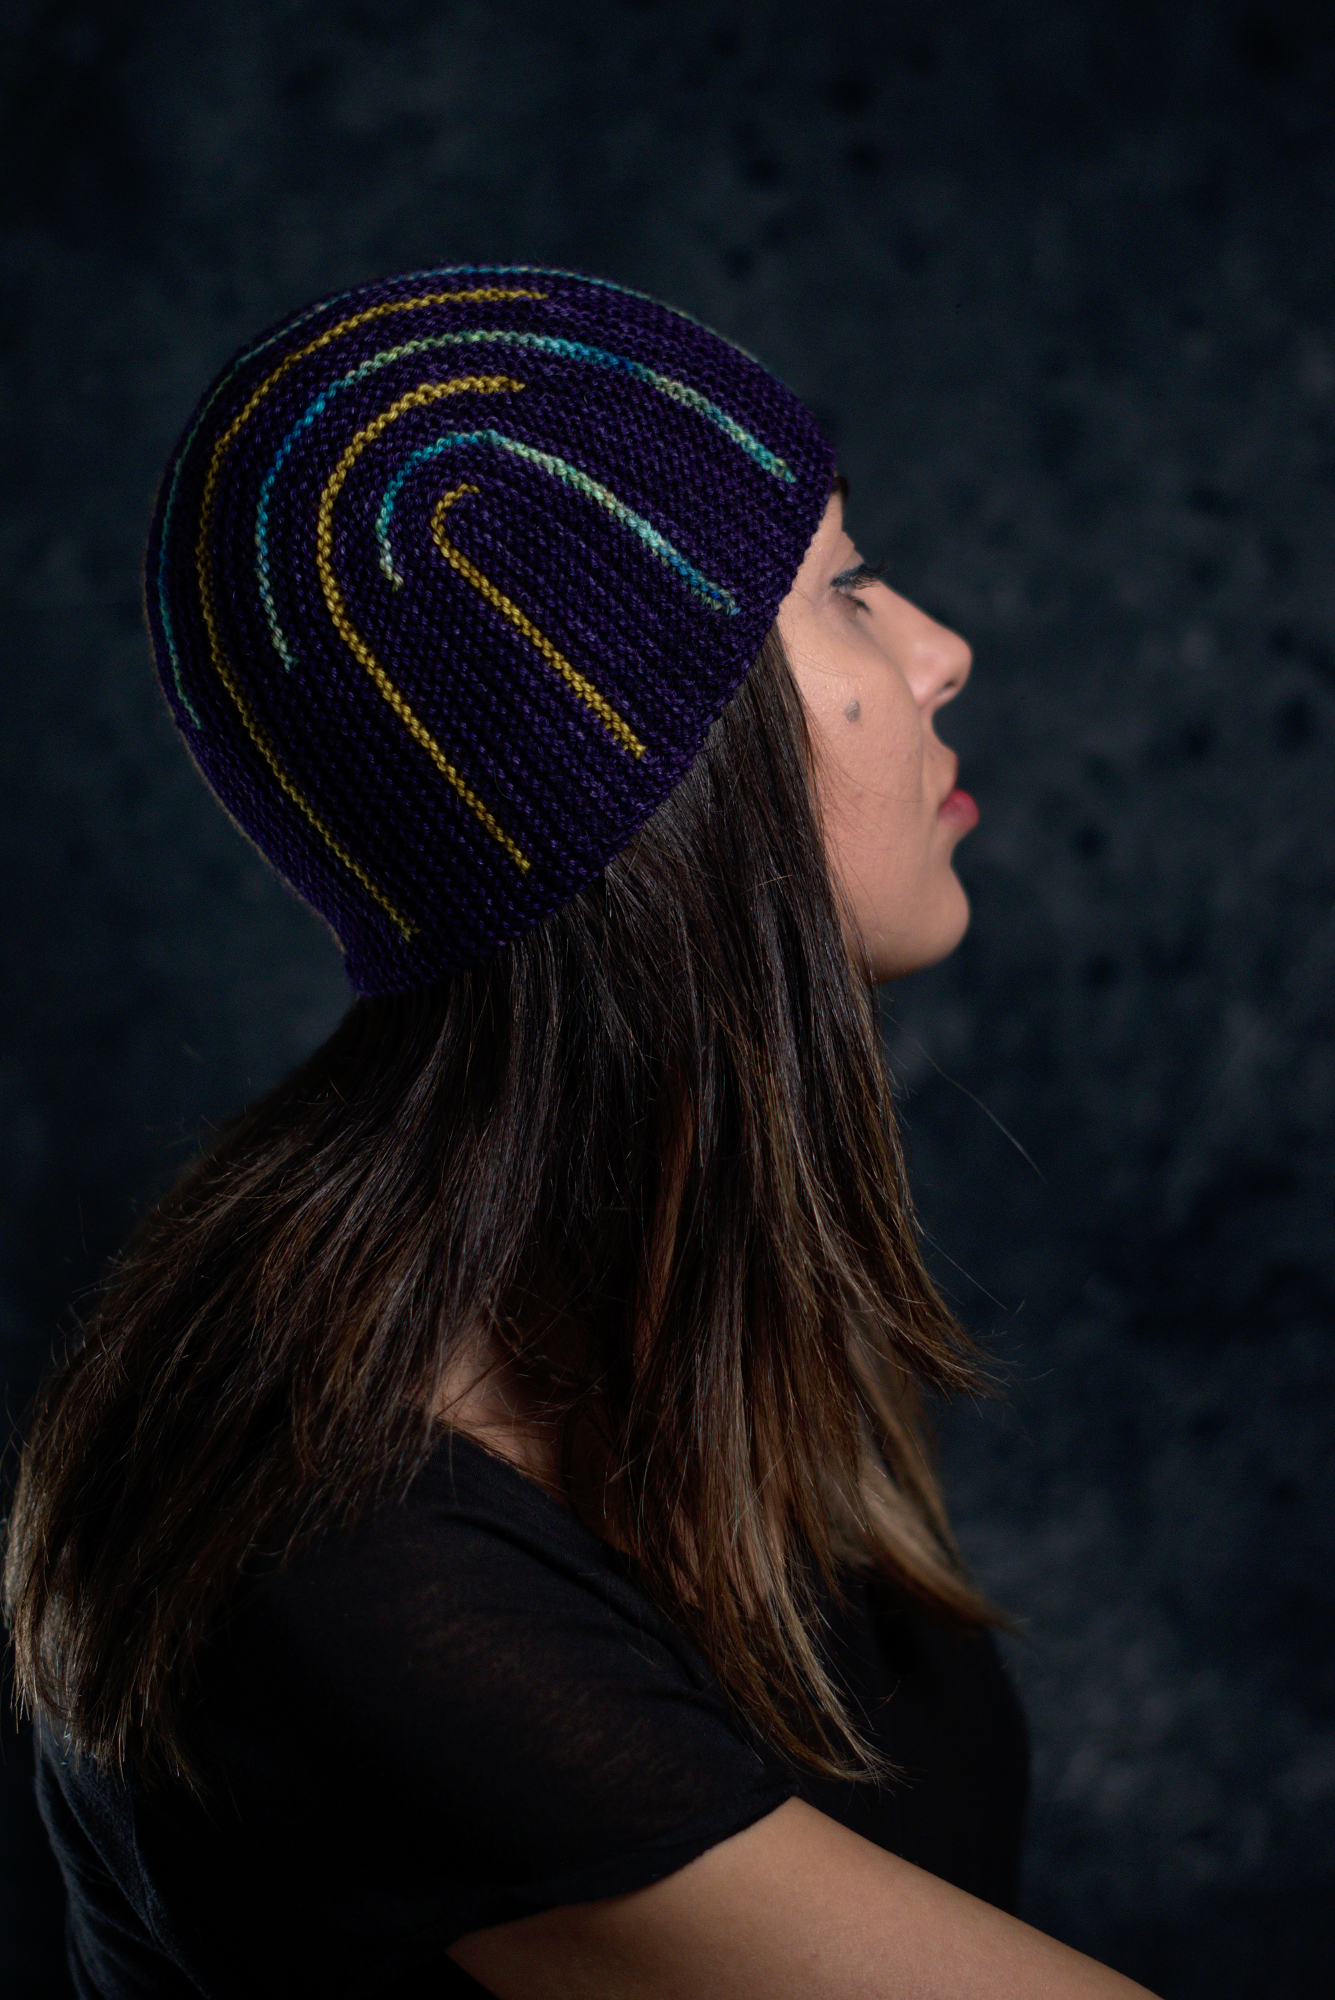 Duality sideways knit short row striped hat knitting pattern